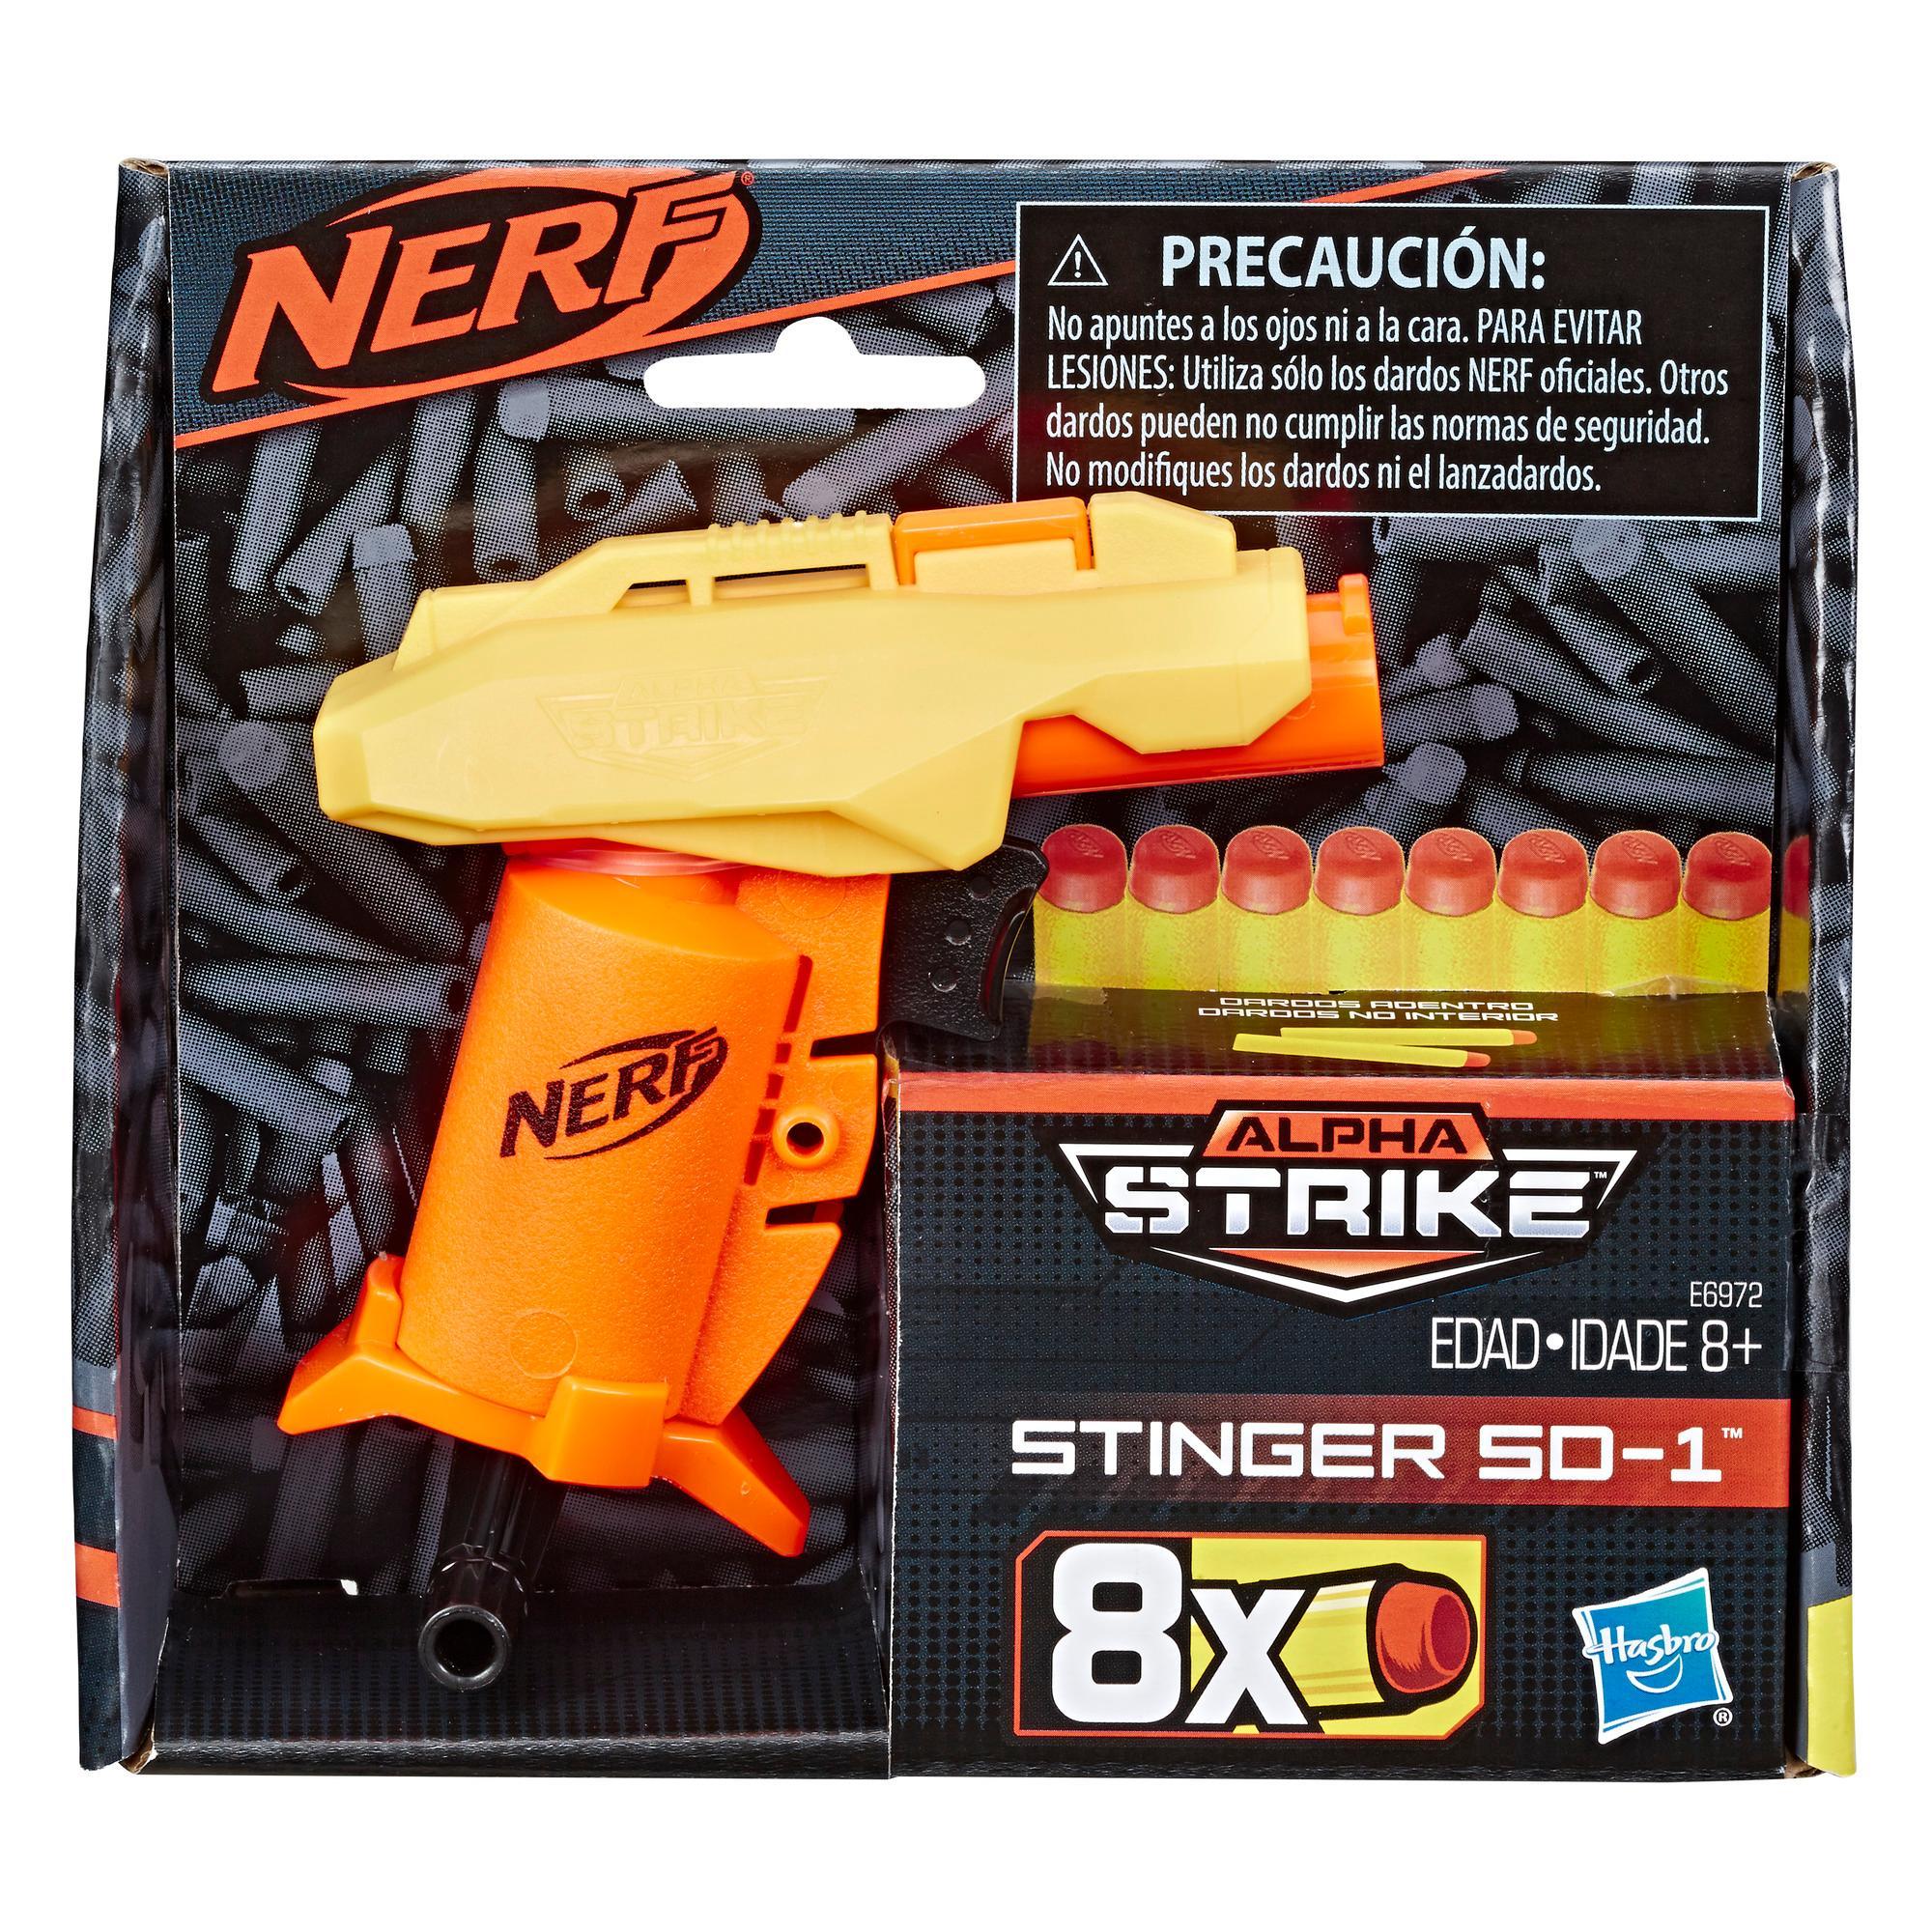 Lanzador de juguete Stinger SD-1 Nerf Alpha Strike